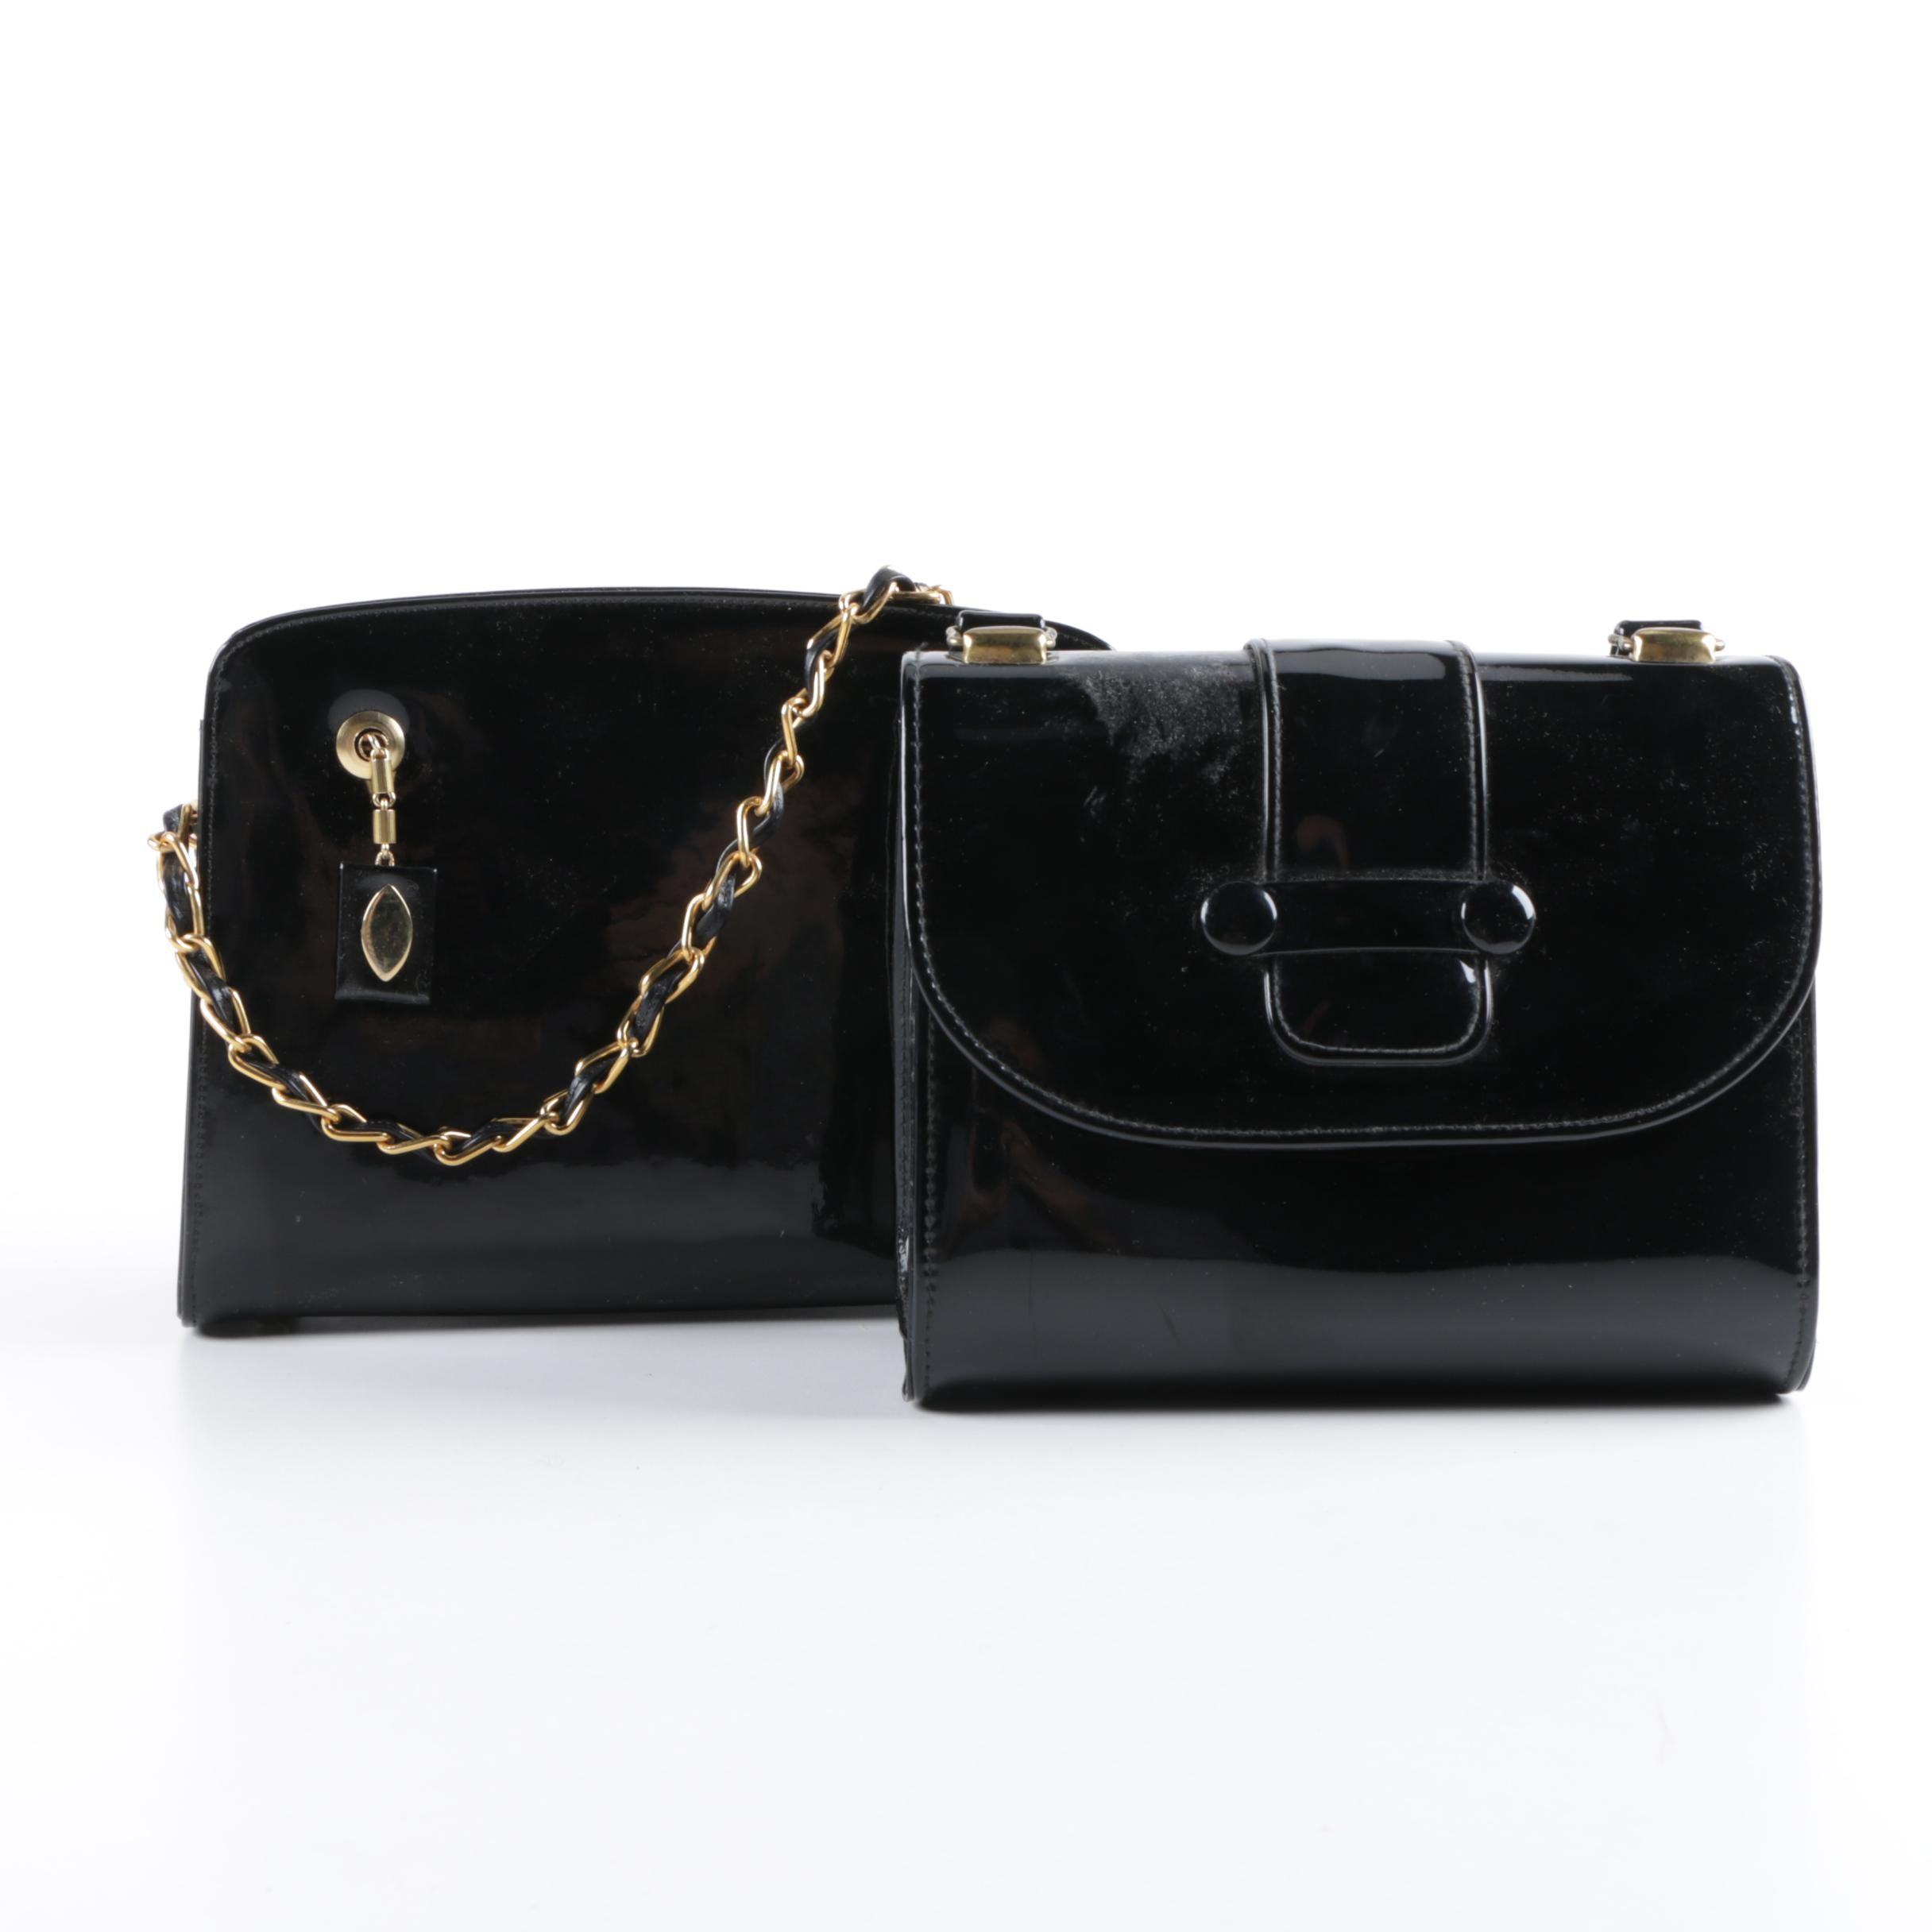 Vintage Black Patent Leather Handbags Including Coblentz Original